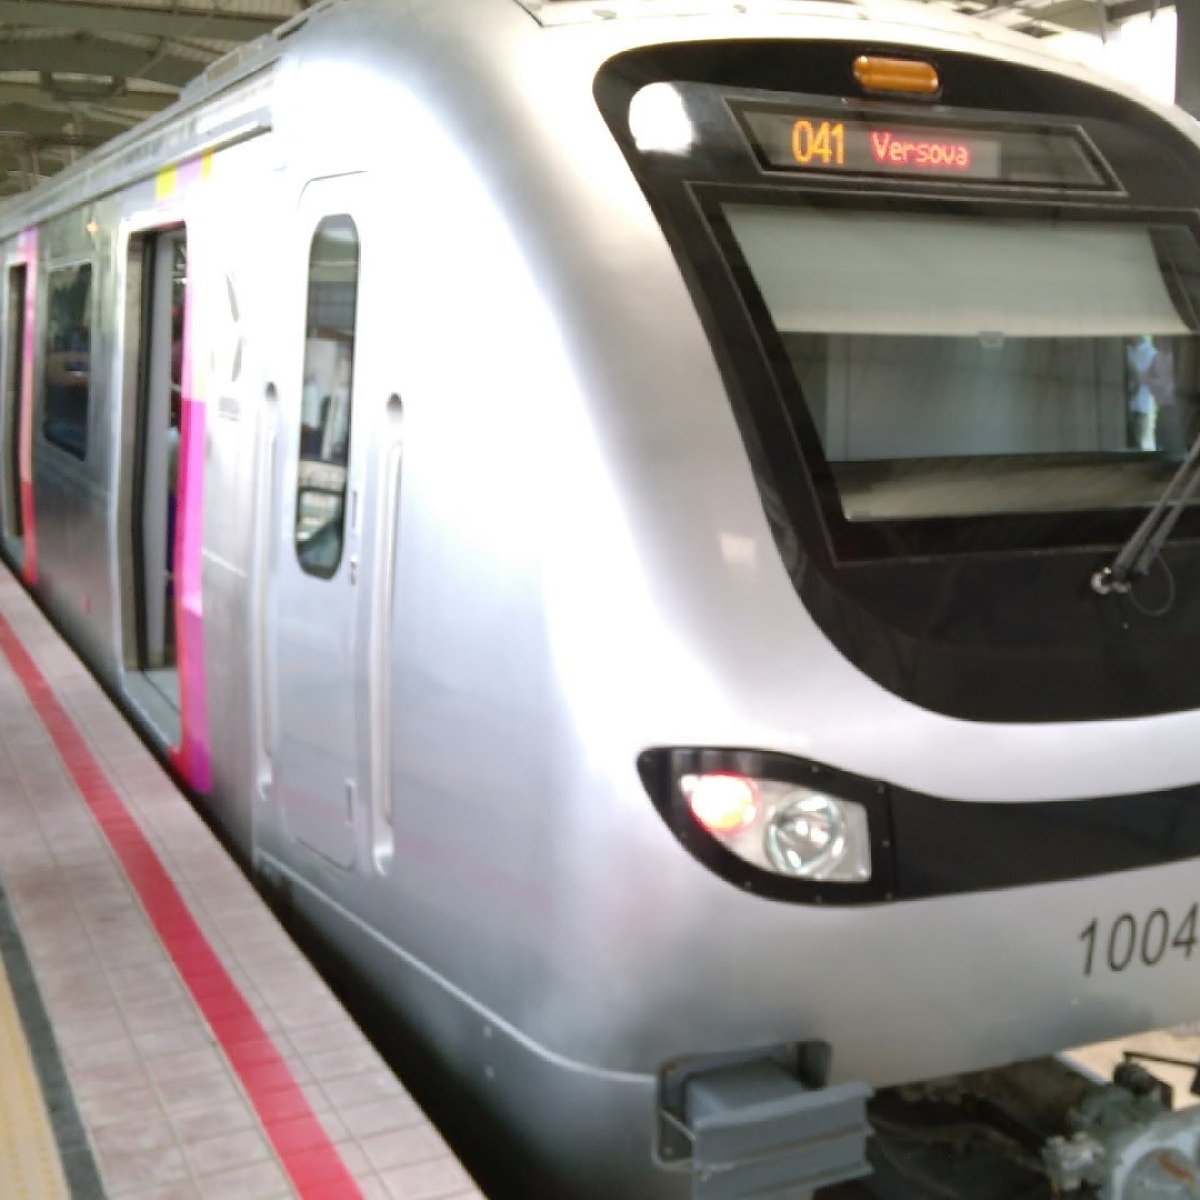 'Disease will spread': 'Metro Man' Sreedharan asks PM Modi to reject AAP govt's free travel scheme for women